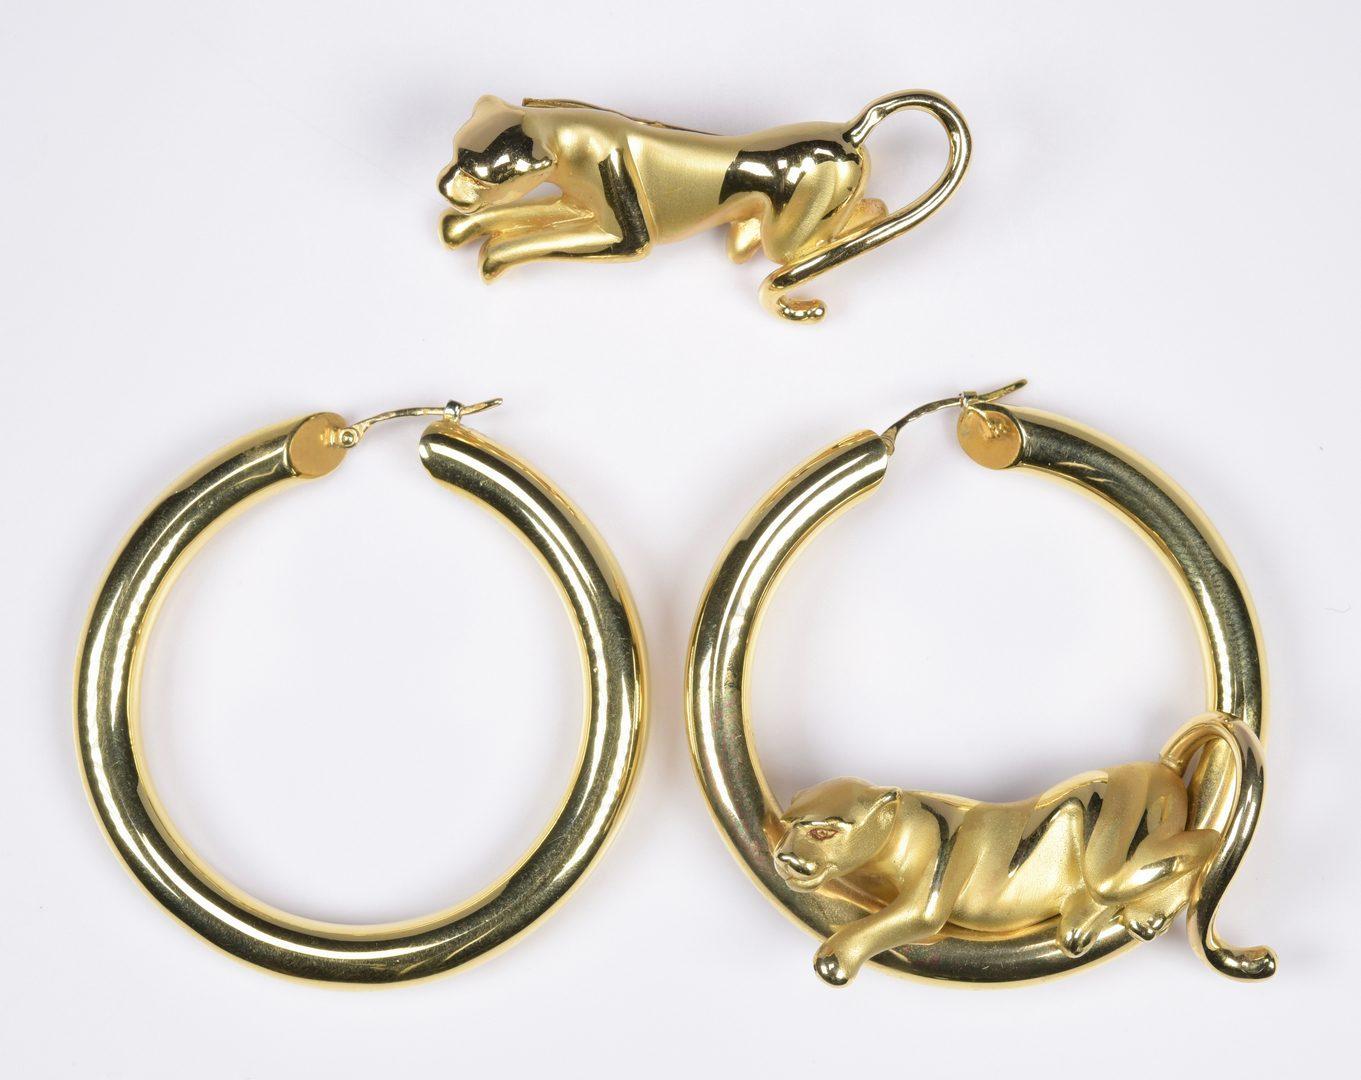 Lot 814: Charles Garnier 18K Panther Jewelry